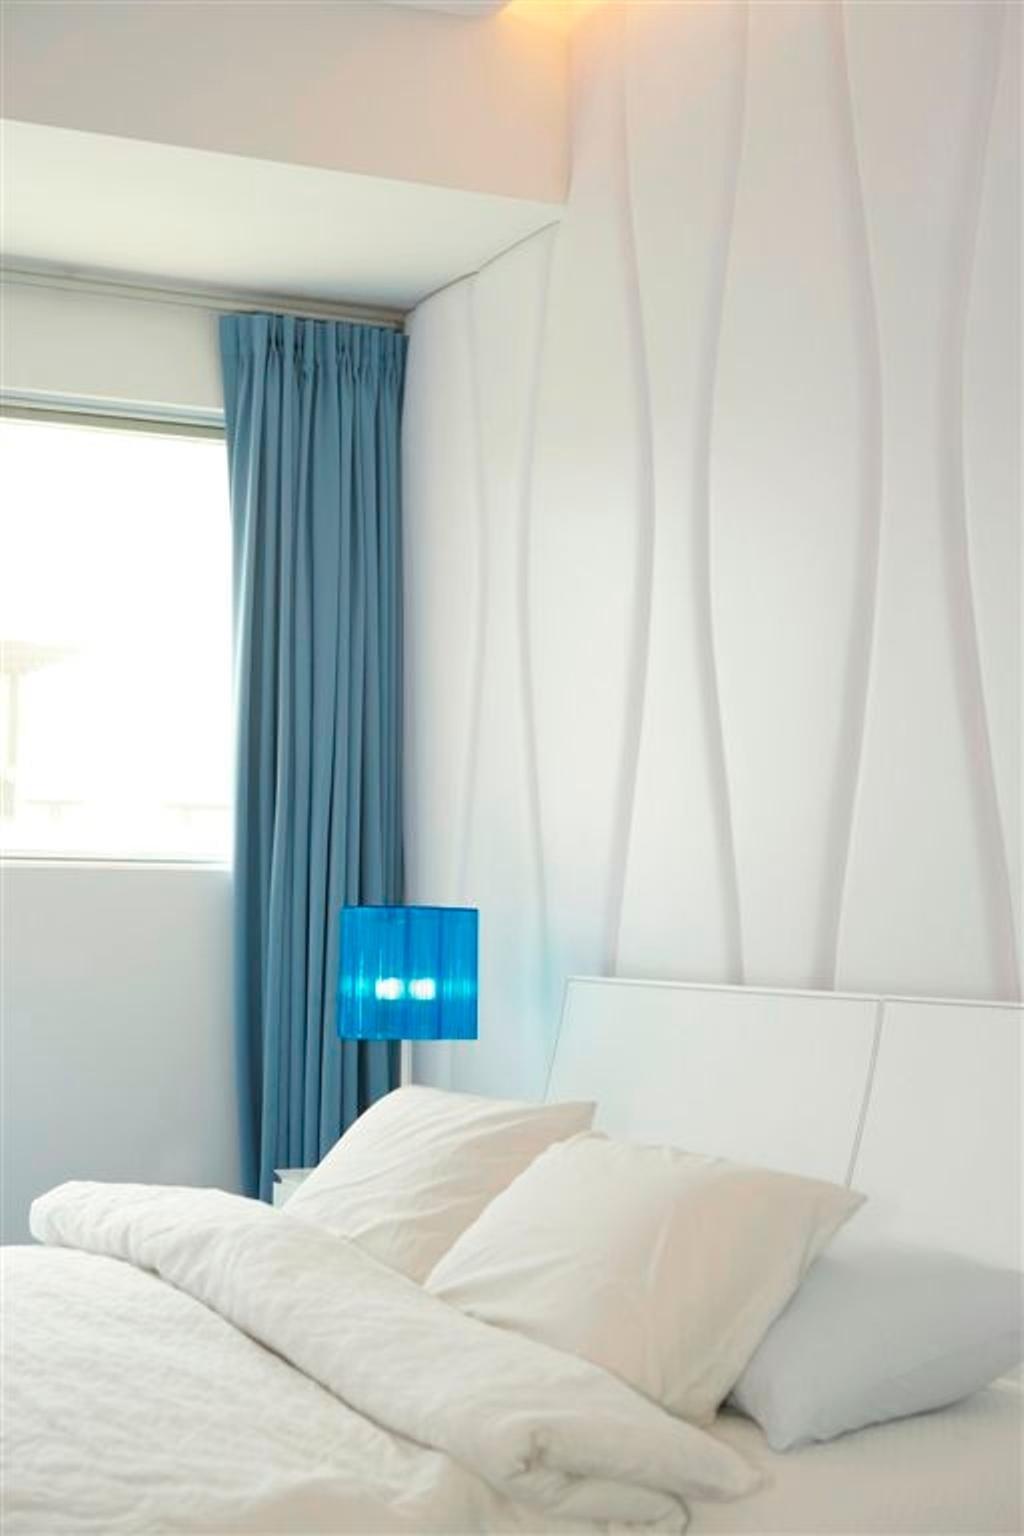 Transitional, Landed, Bedroom, Sembawang, Interior Designer, Free Space Intent